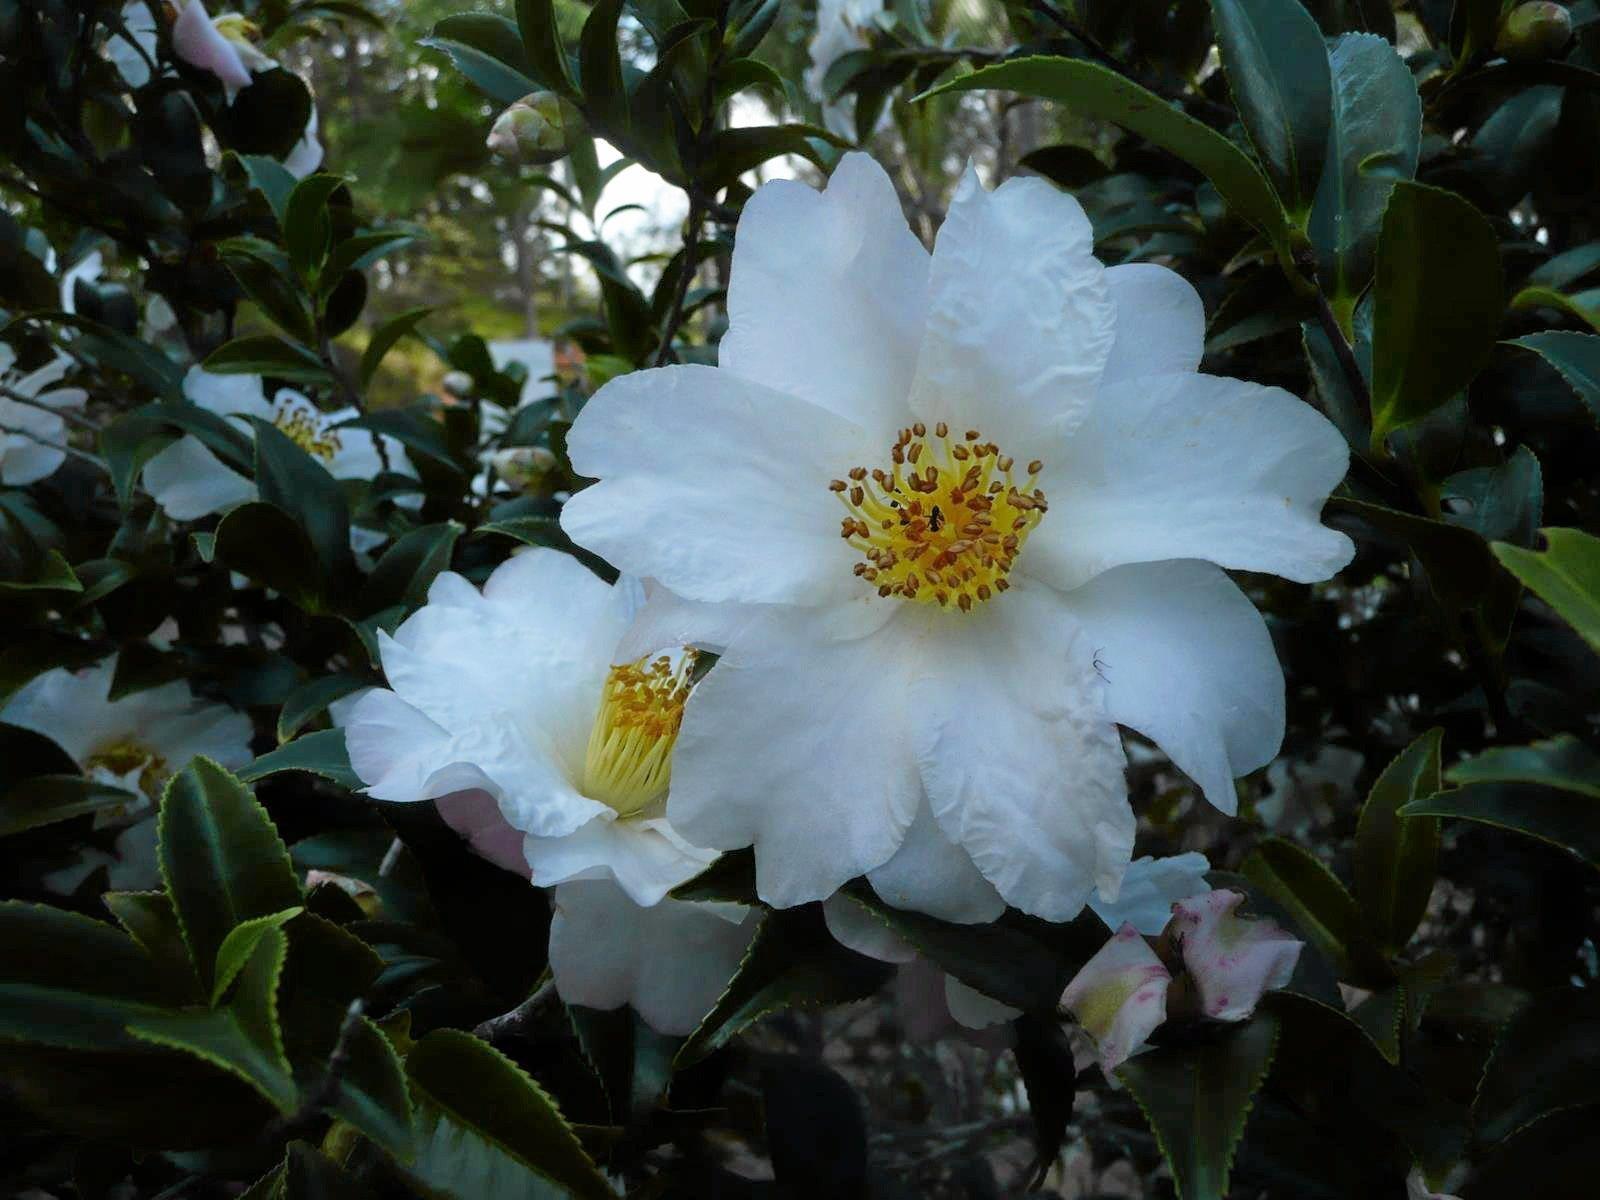 The outstanding single white C. sasanqua.